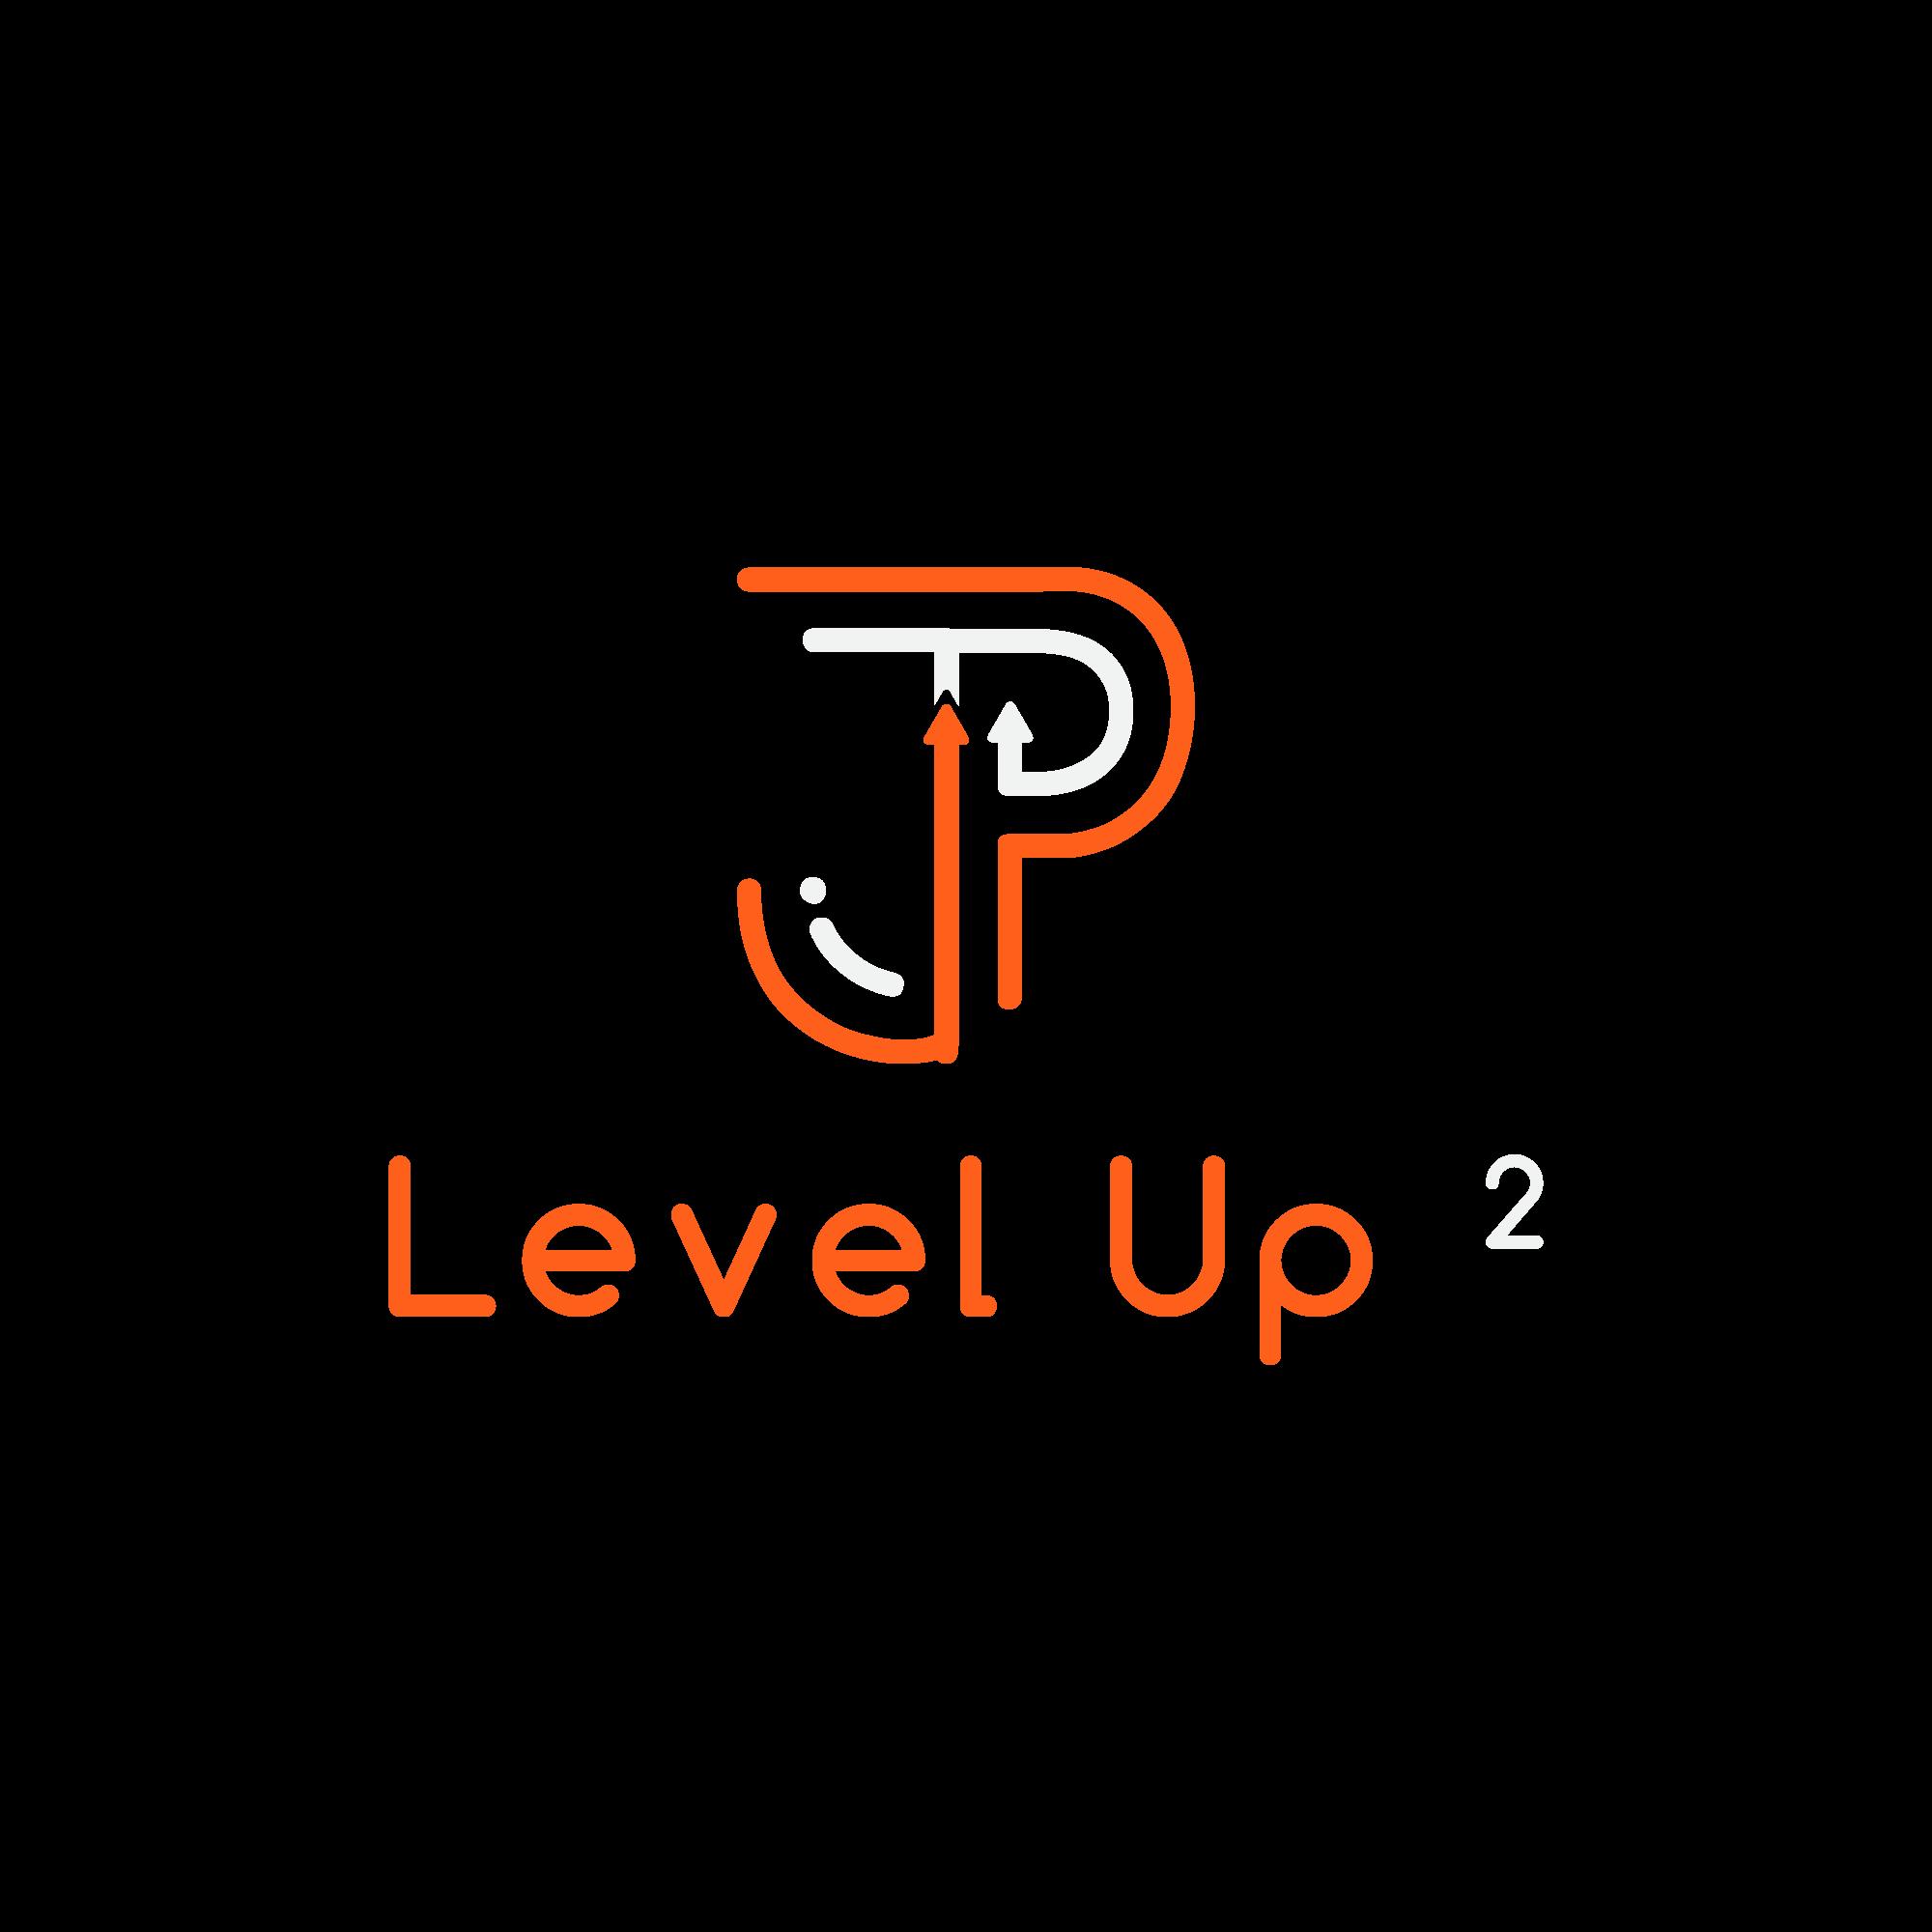 JP-Level-Up-2-LOGO-B1.png